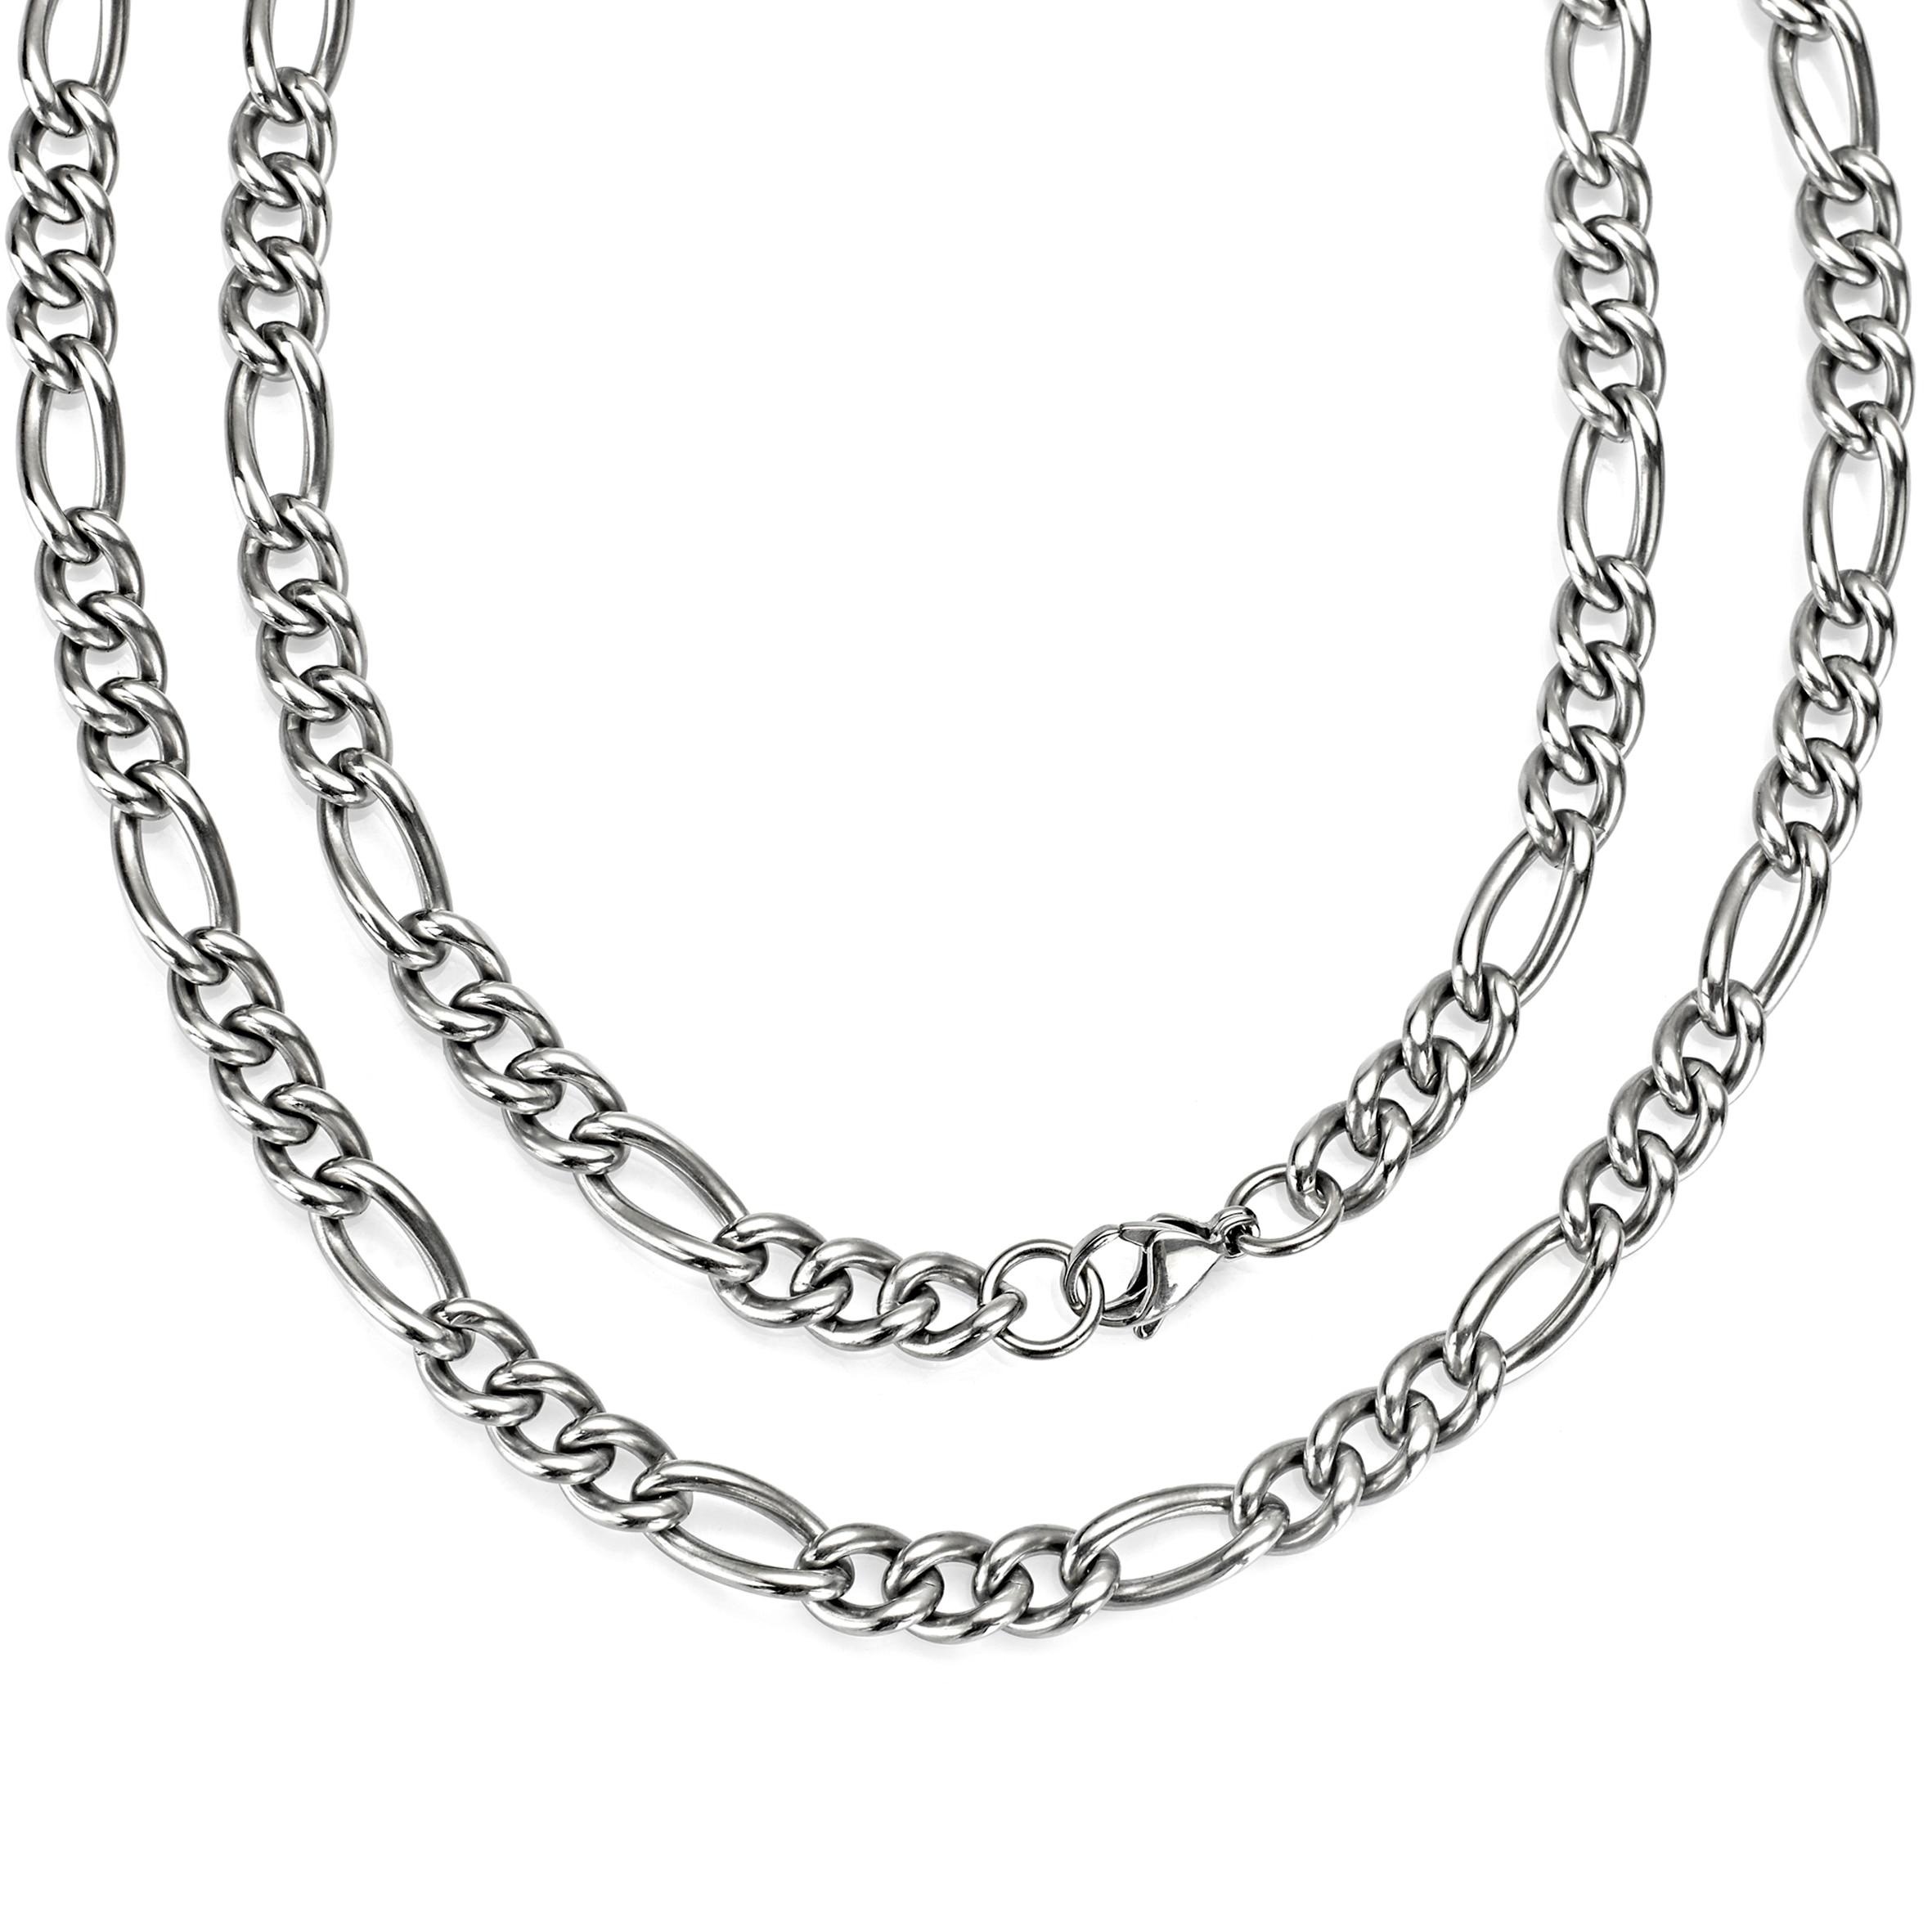 7mm Classic Men Women Curb Necklace Pure Titanium Hypoallergenic Link Chain Silver Color 22 24